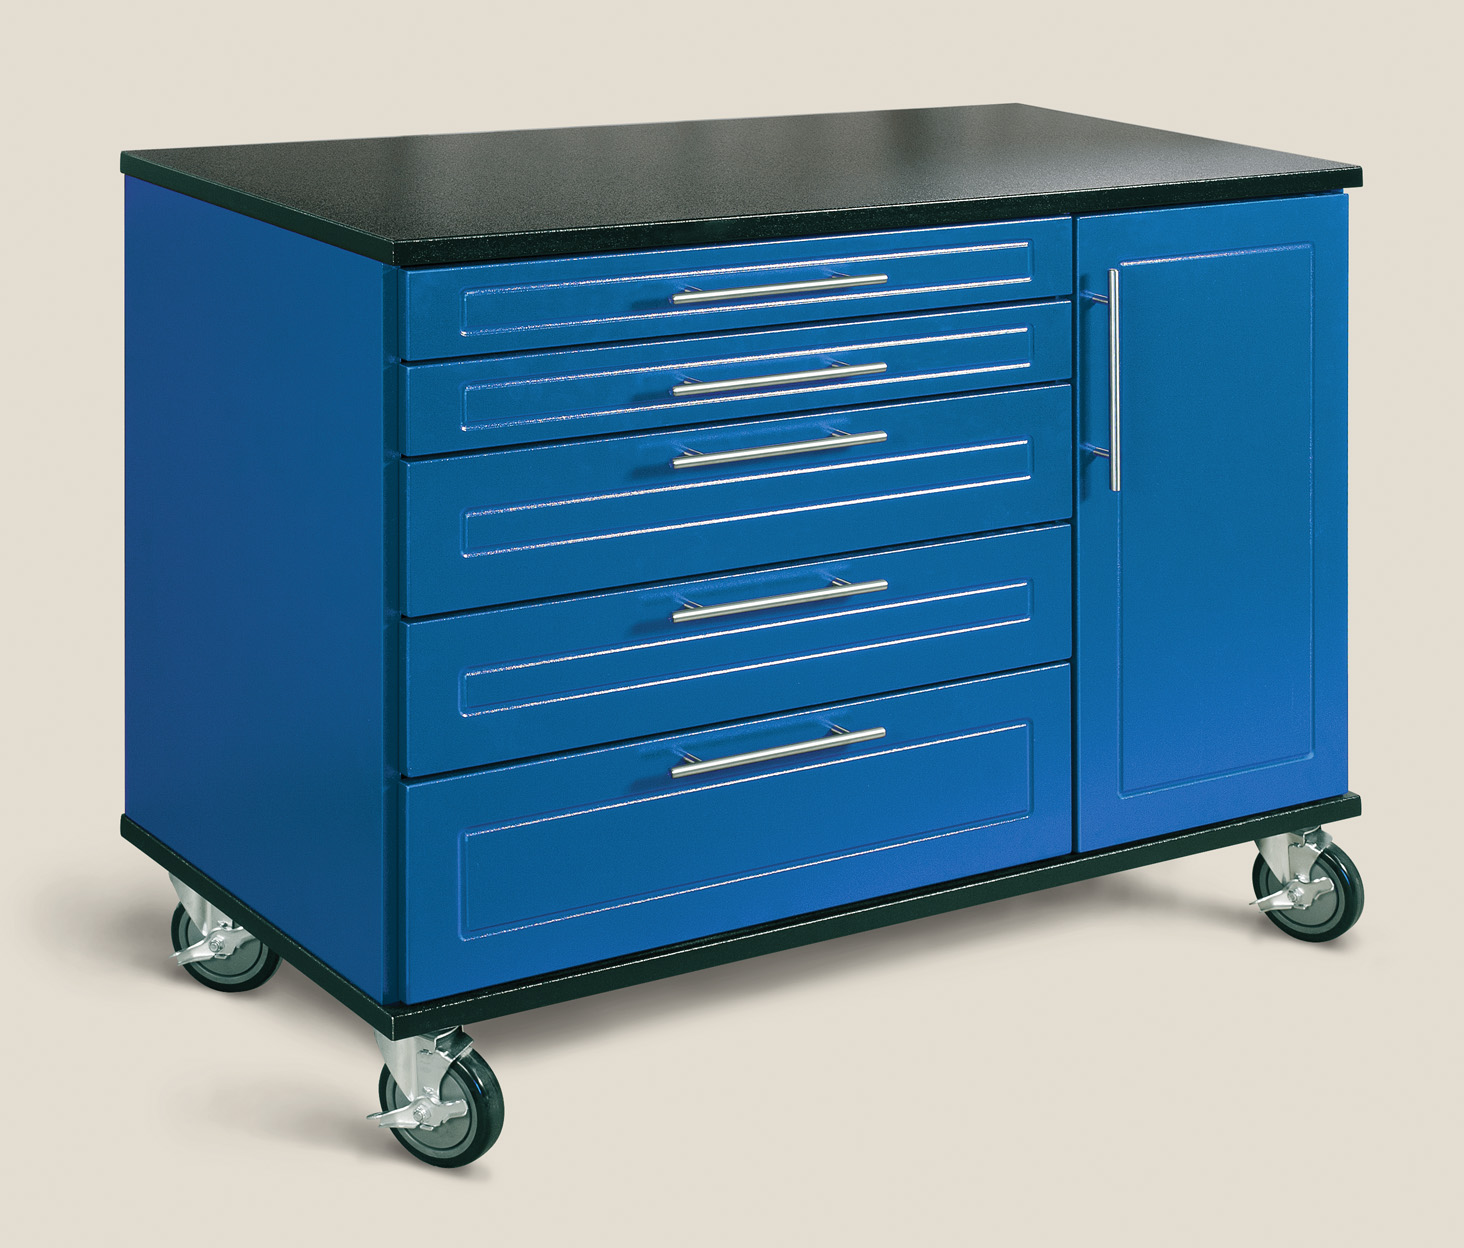 Local Garage Storage Systems Dealer Announces Agreement ...